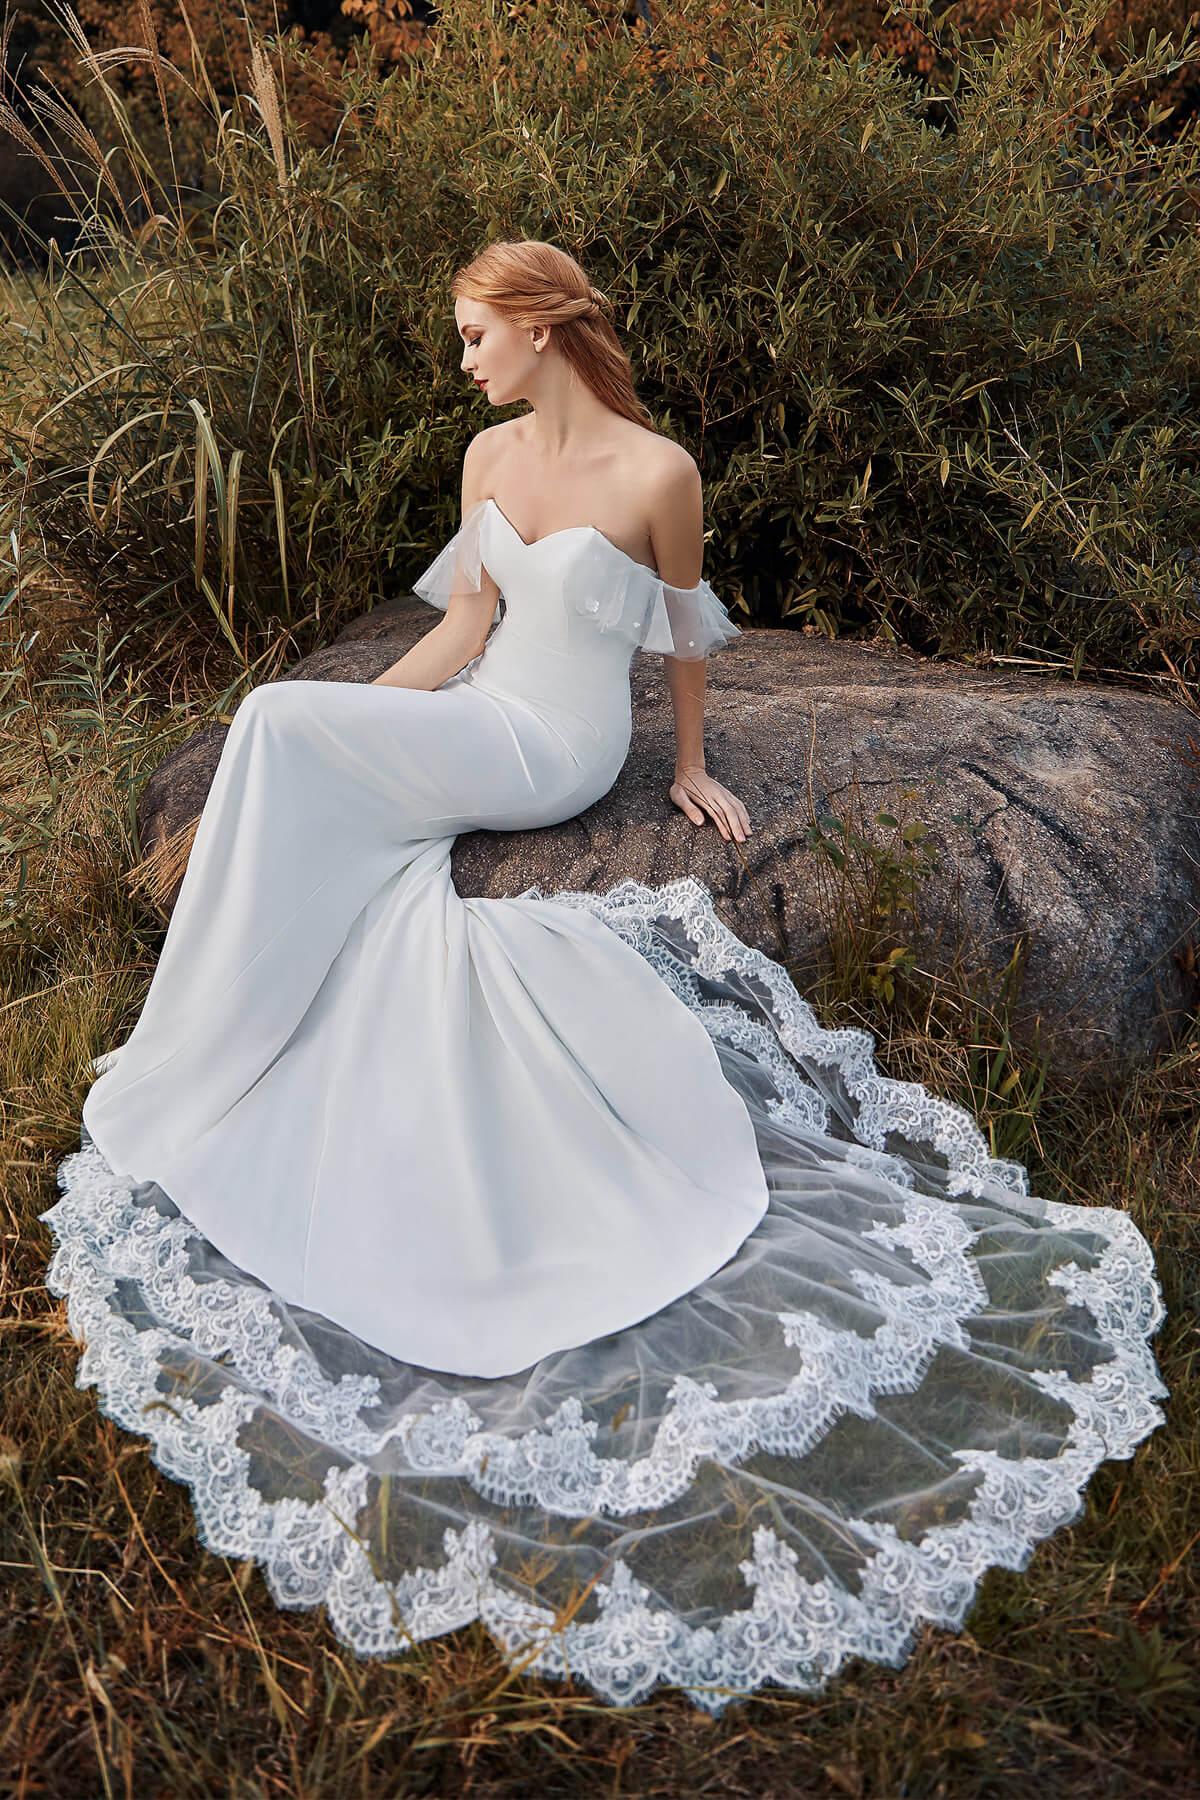 Cocomelody Black Wedding Dress List - CW2217